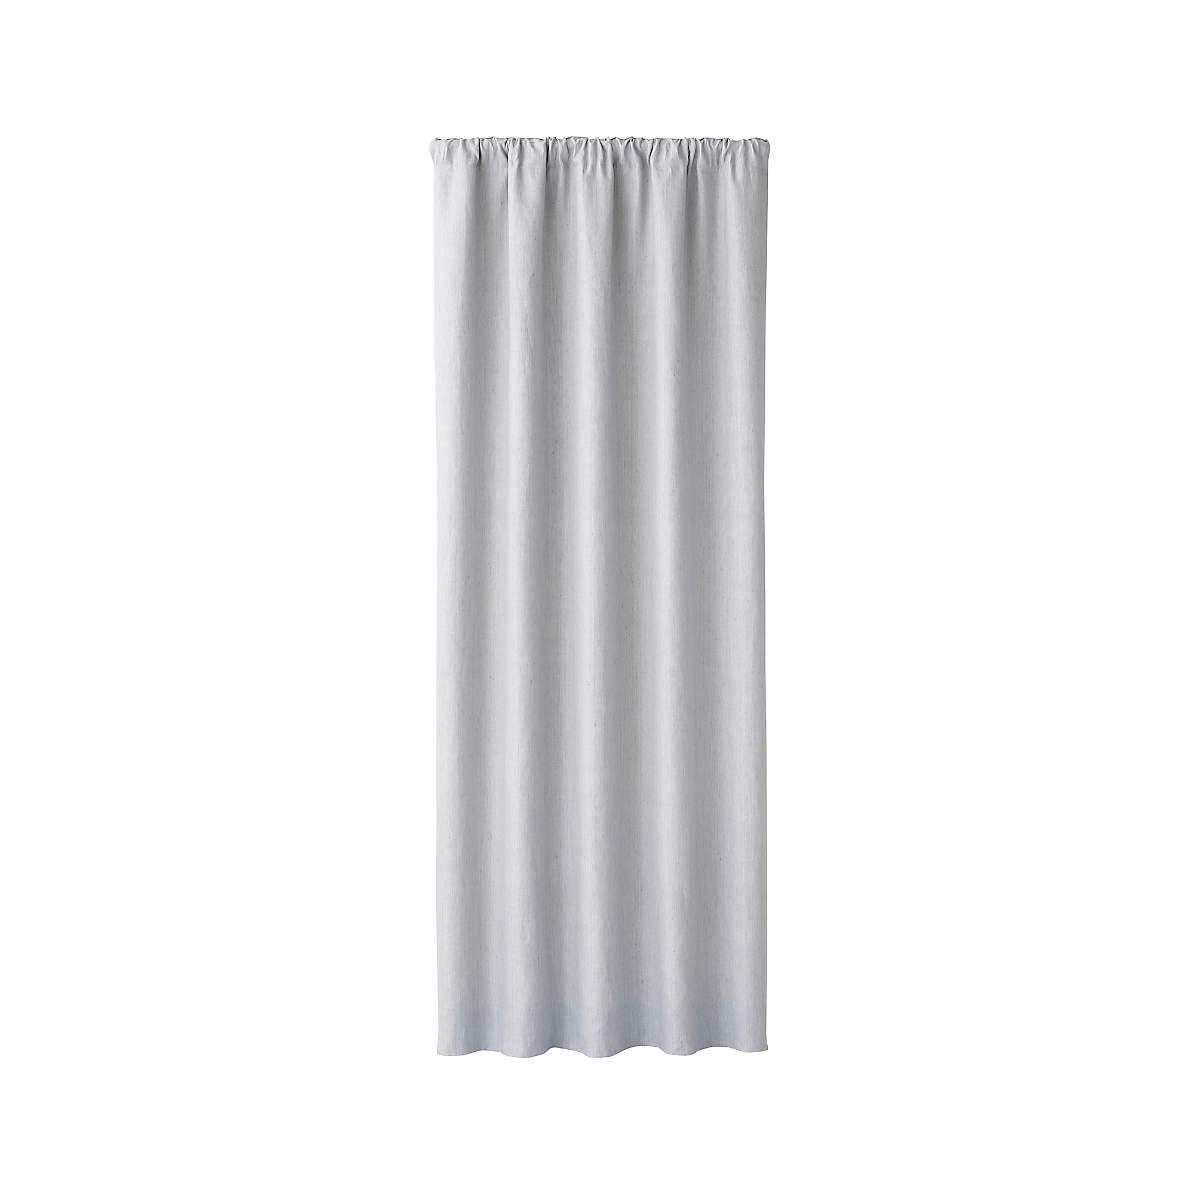 Largo Grey Linen Blackout Curtain Panel